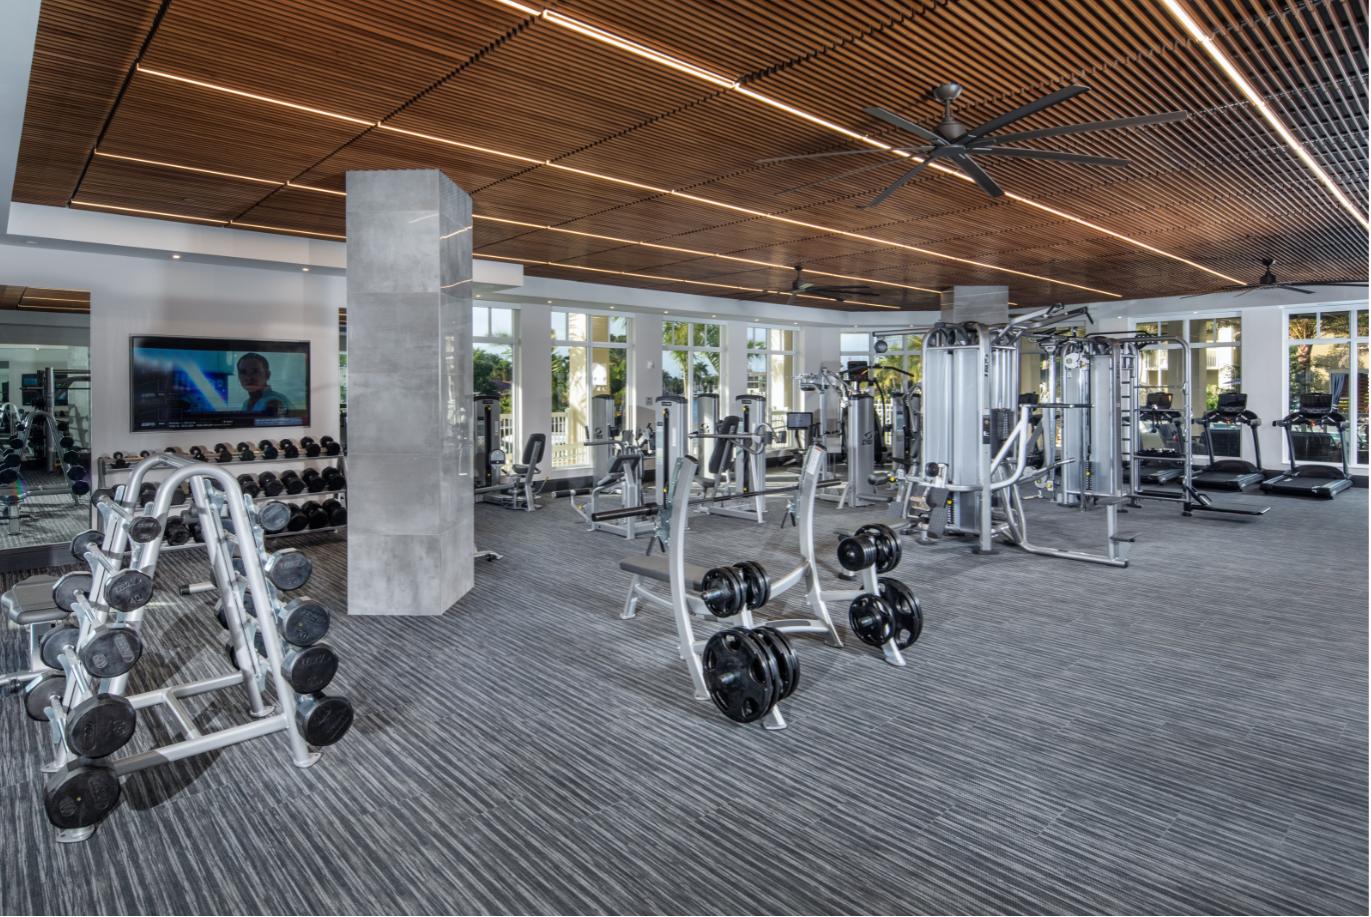 broadstone gym 1